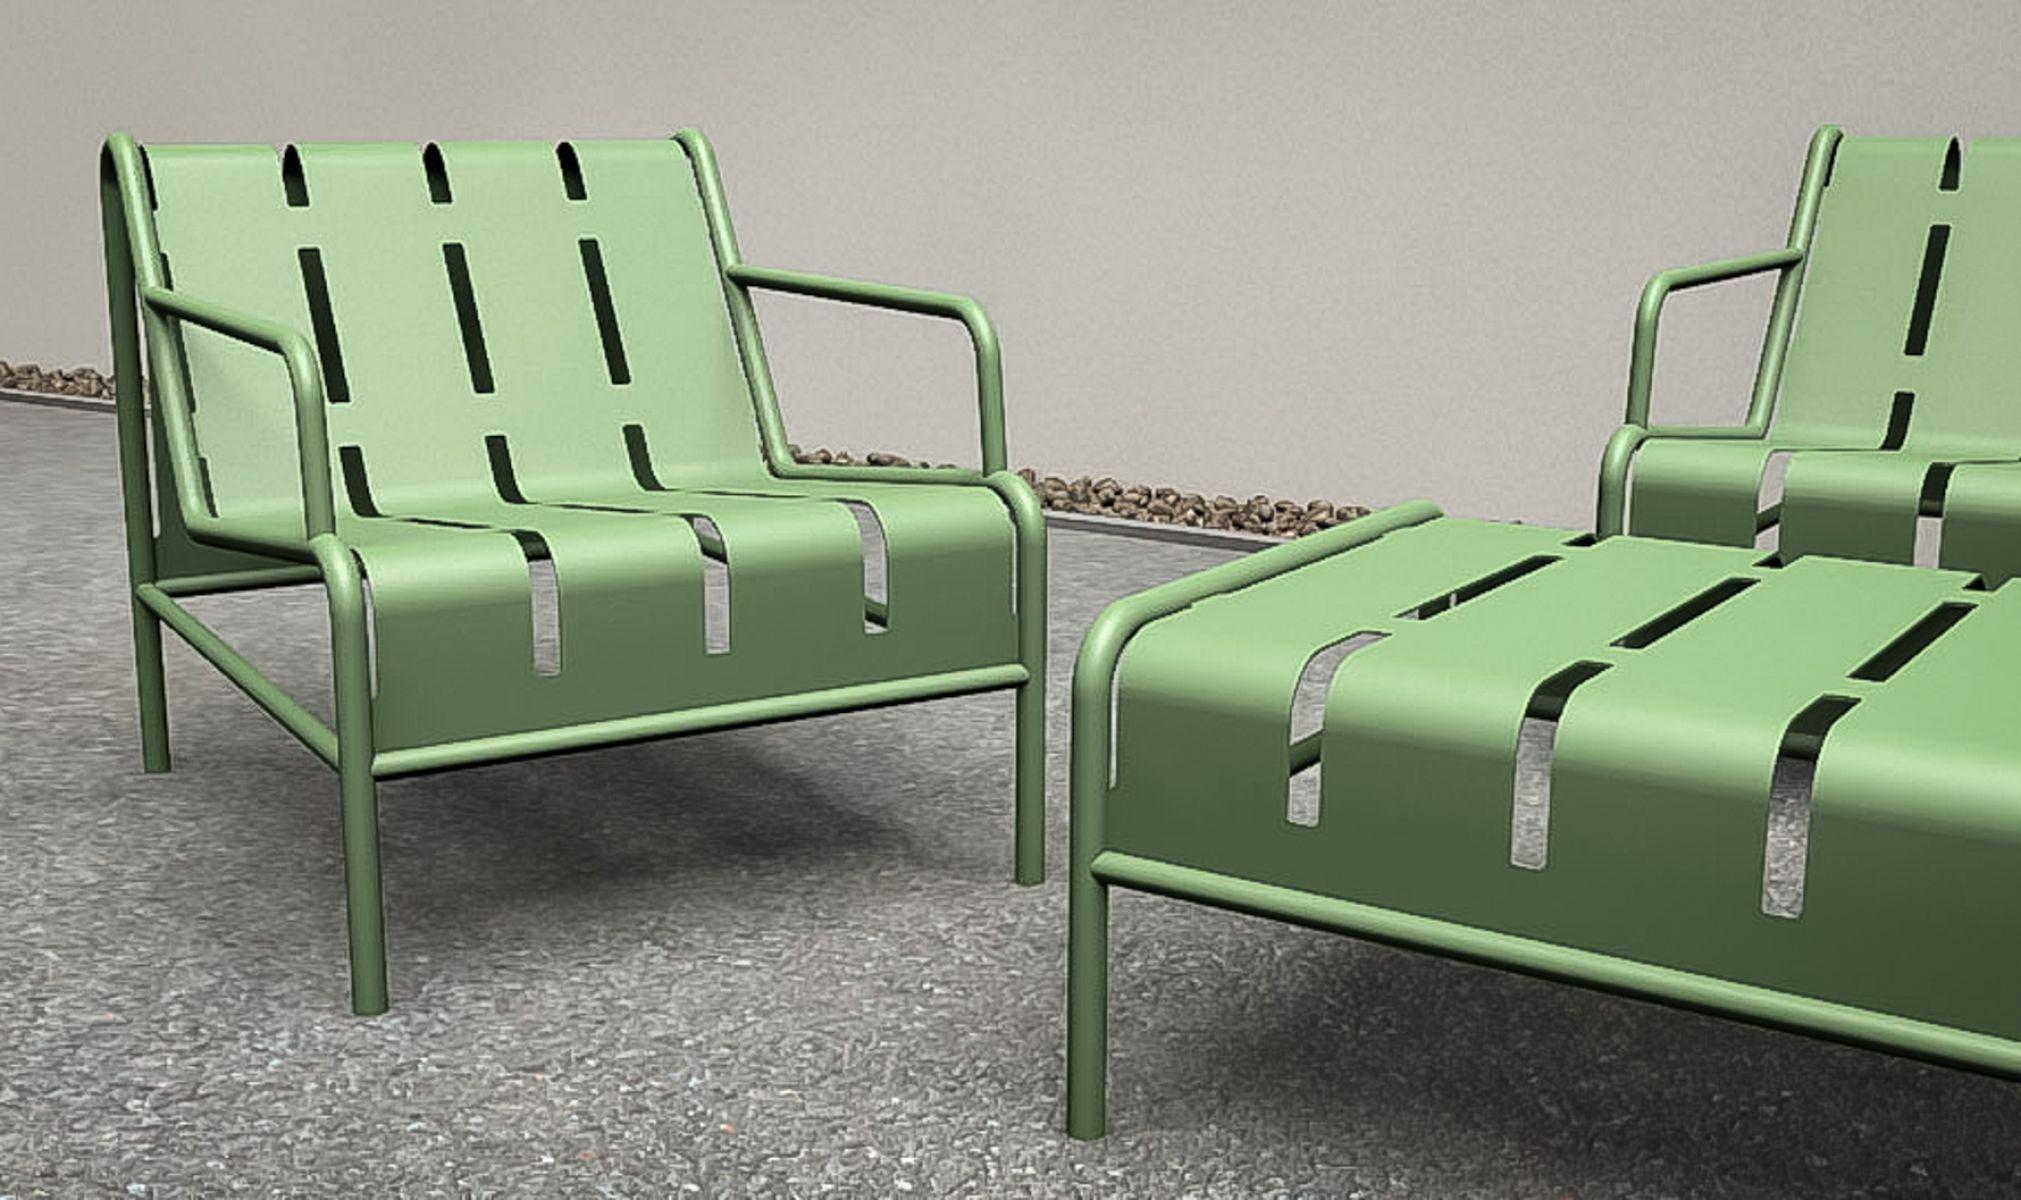 Chilly B tafel - Modern lounge meubilair voor (semi) openbare ruimte